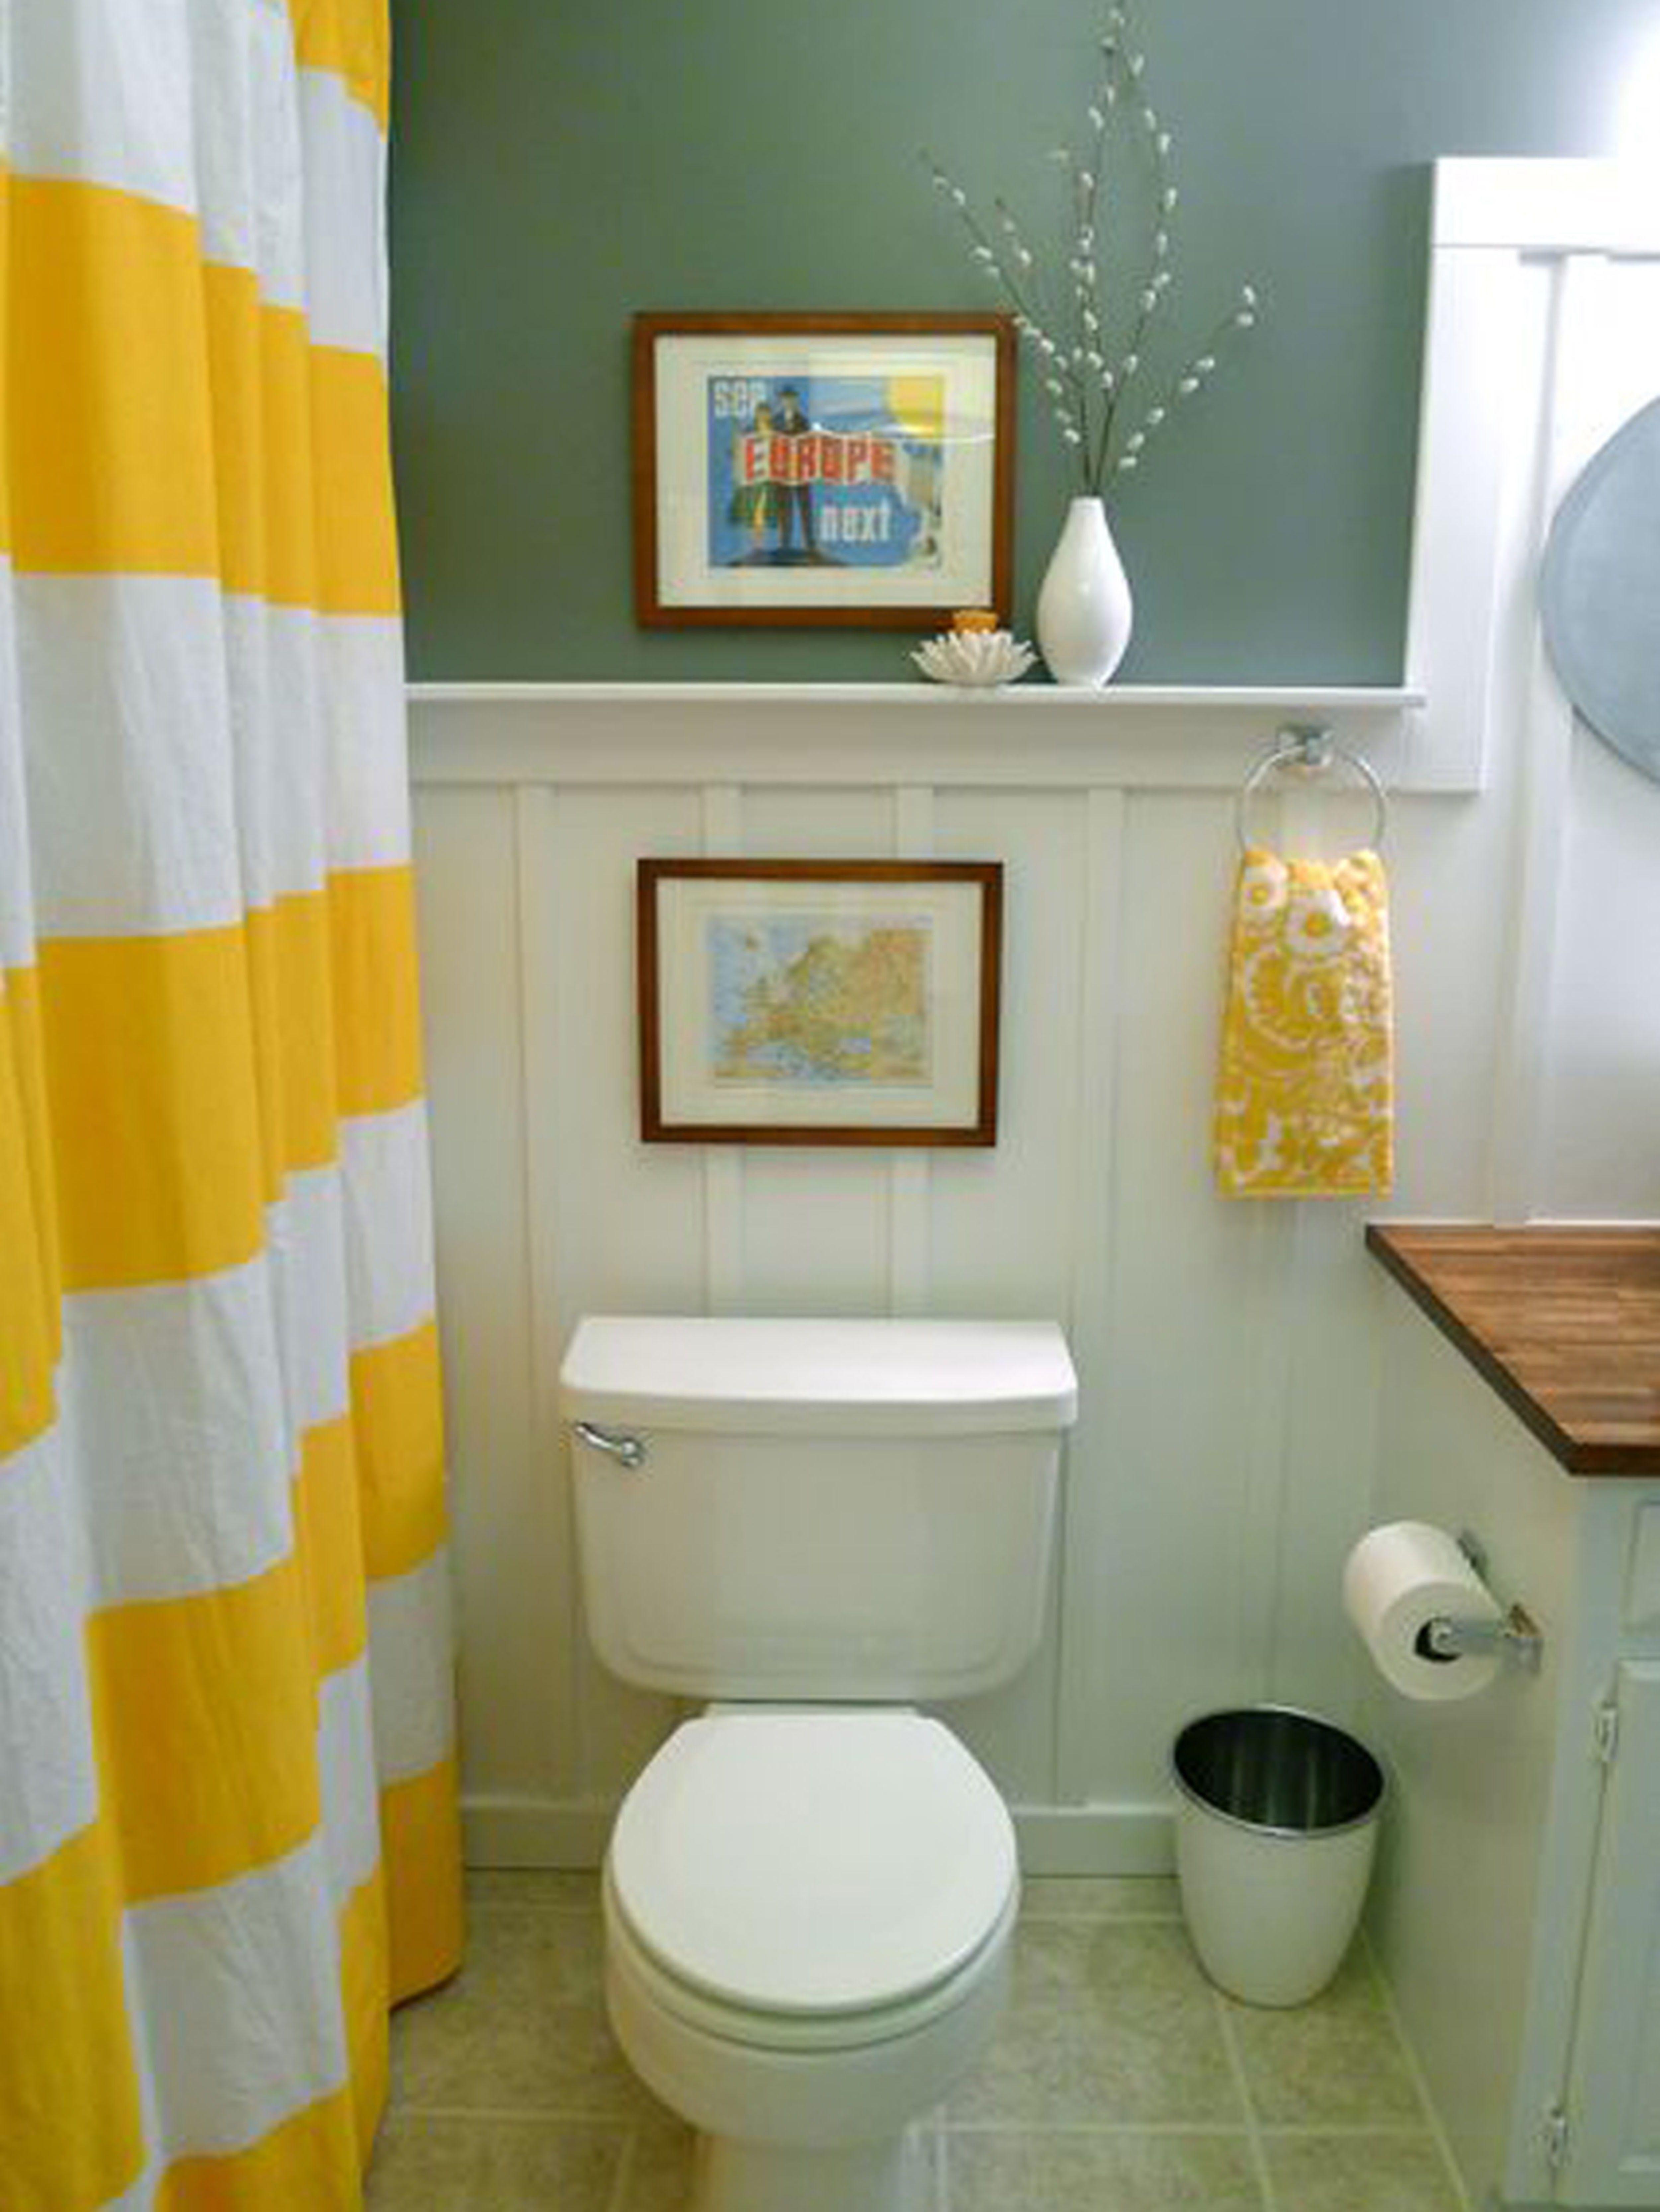 Apartment Bathroom Designs Adorable Apartment Bathroom Decorating Ideas With Special Room Accent Traba Design Ideas